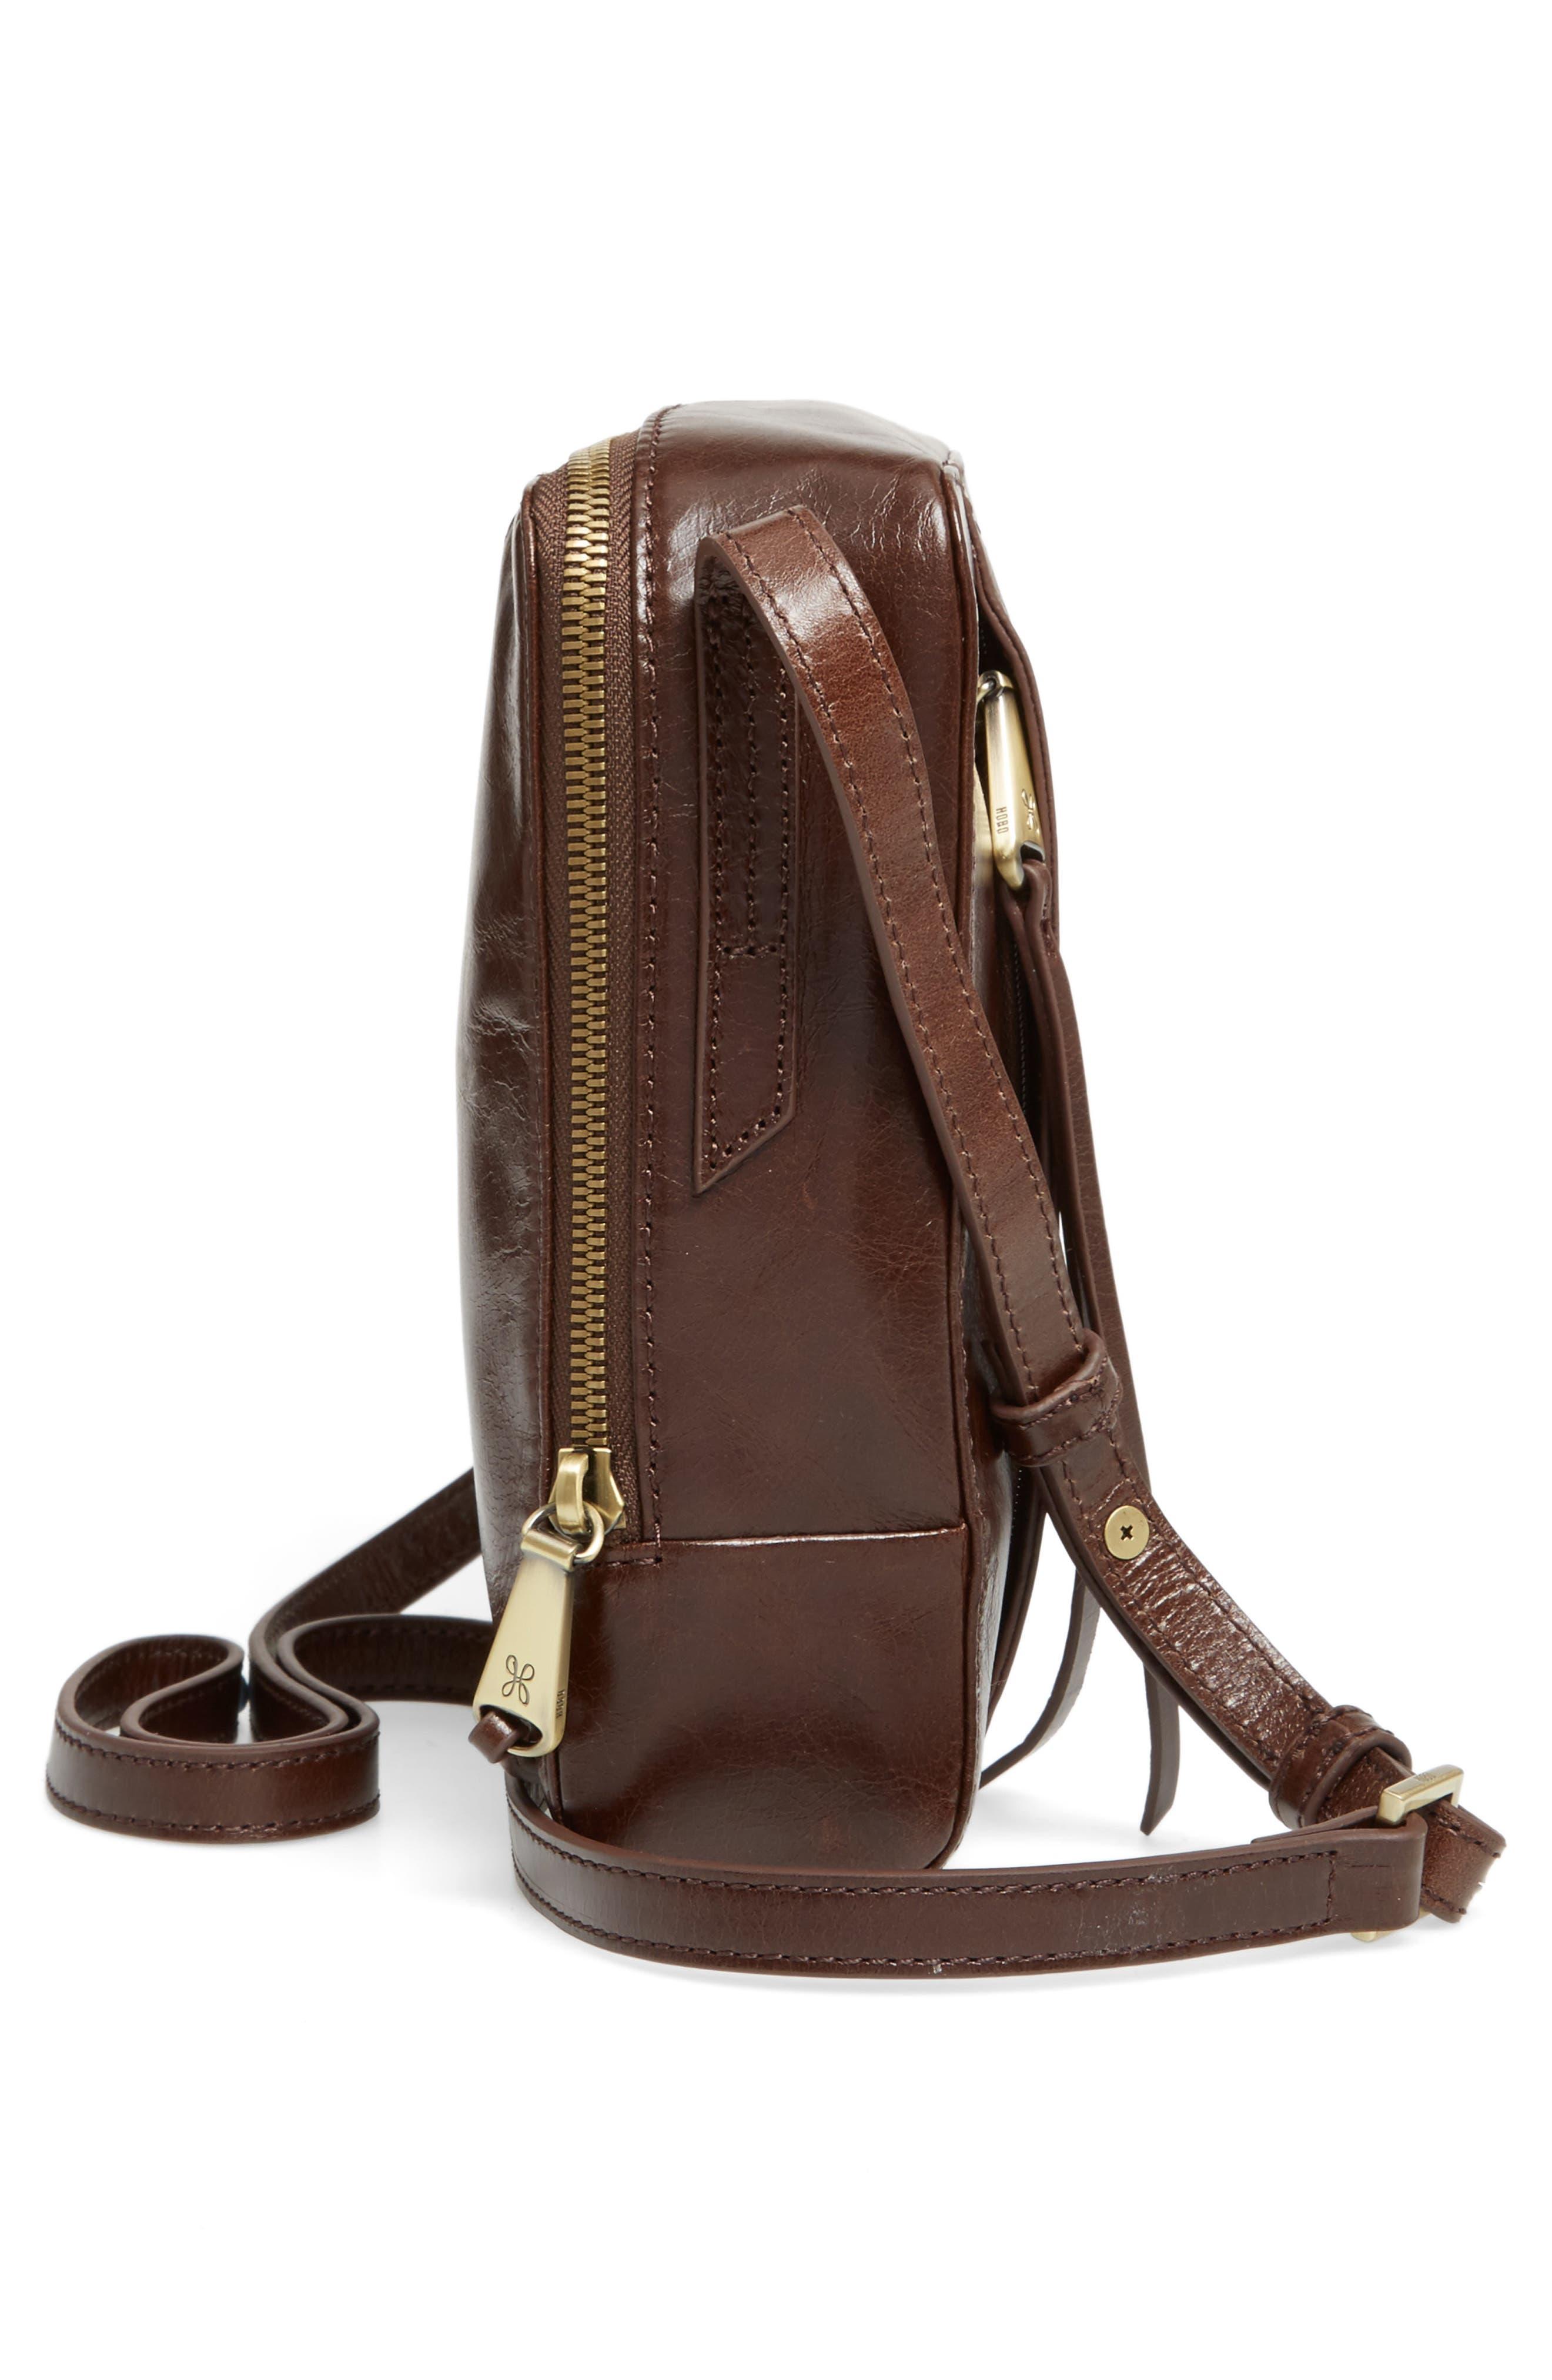 Lyric Leather Crossbody Bag,                             Alternate thumbnail 5, color,                             Espresso